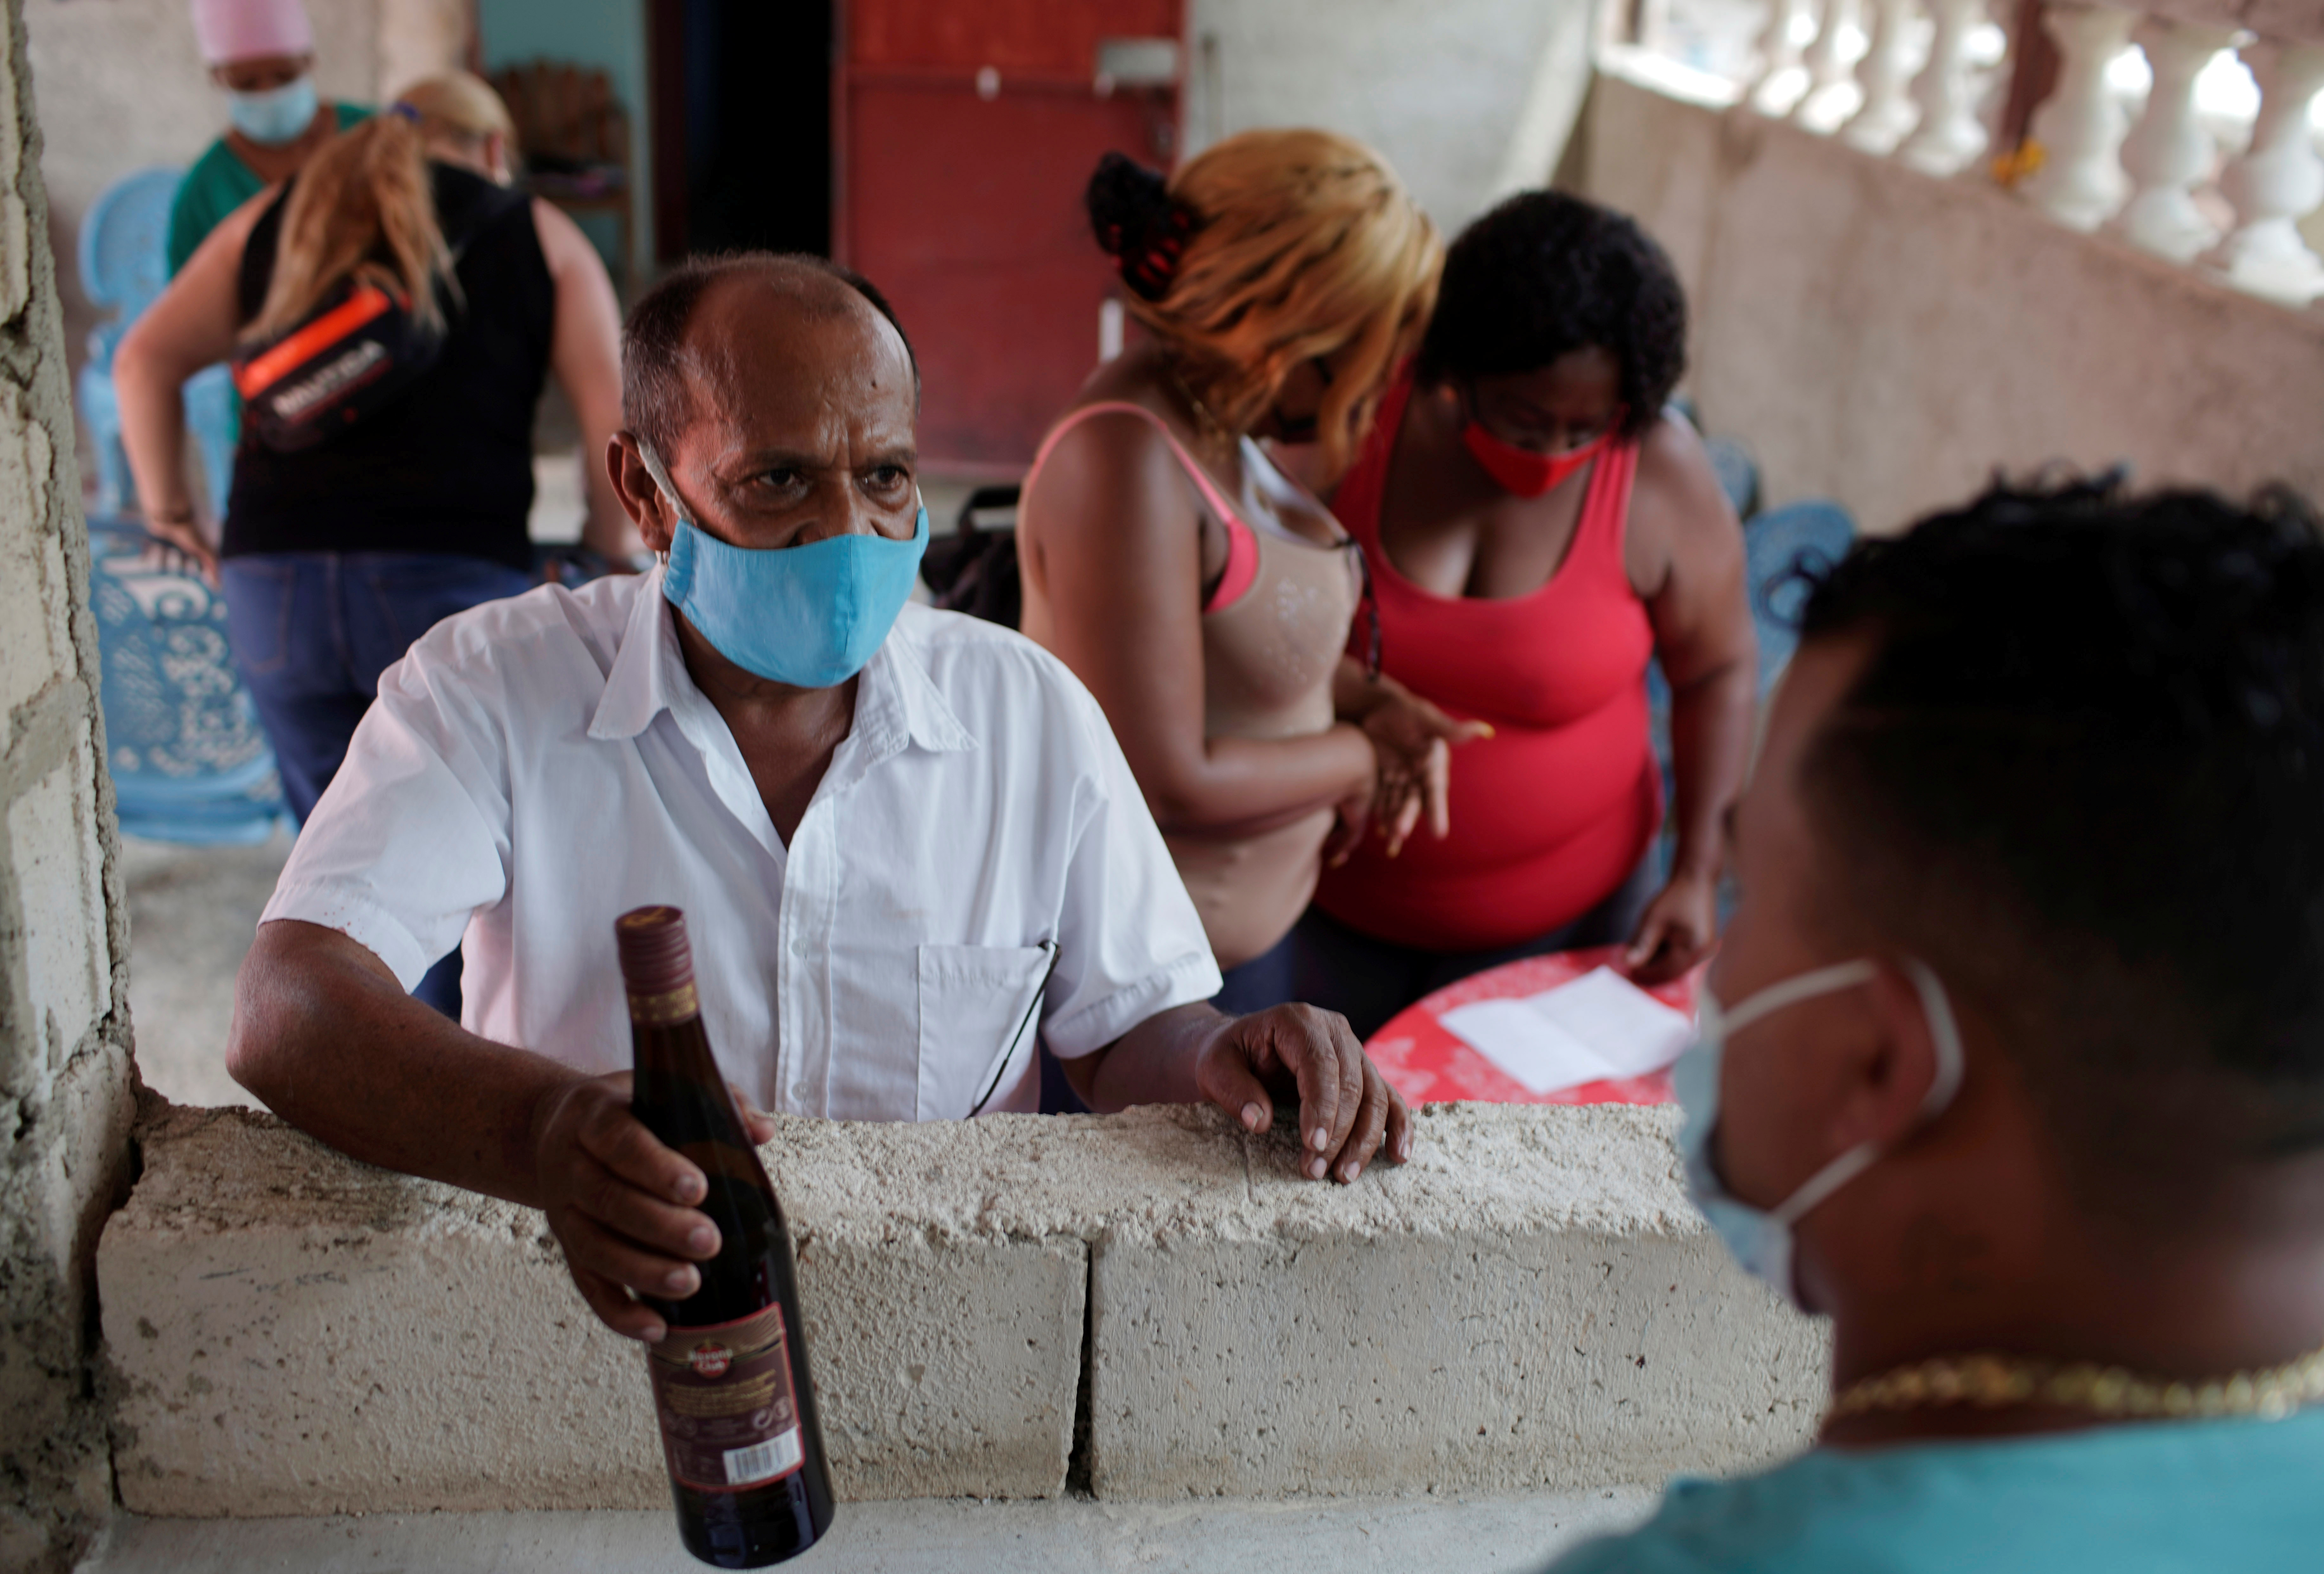 Chofer Eliasez Mendez buys herbal medicine in Havana, Cuba, April 9, 2021. Picture taken on April 9, 2021. REUTERS/Alexandre Meneghini